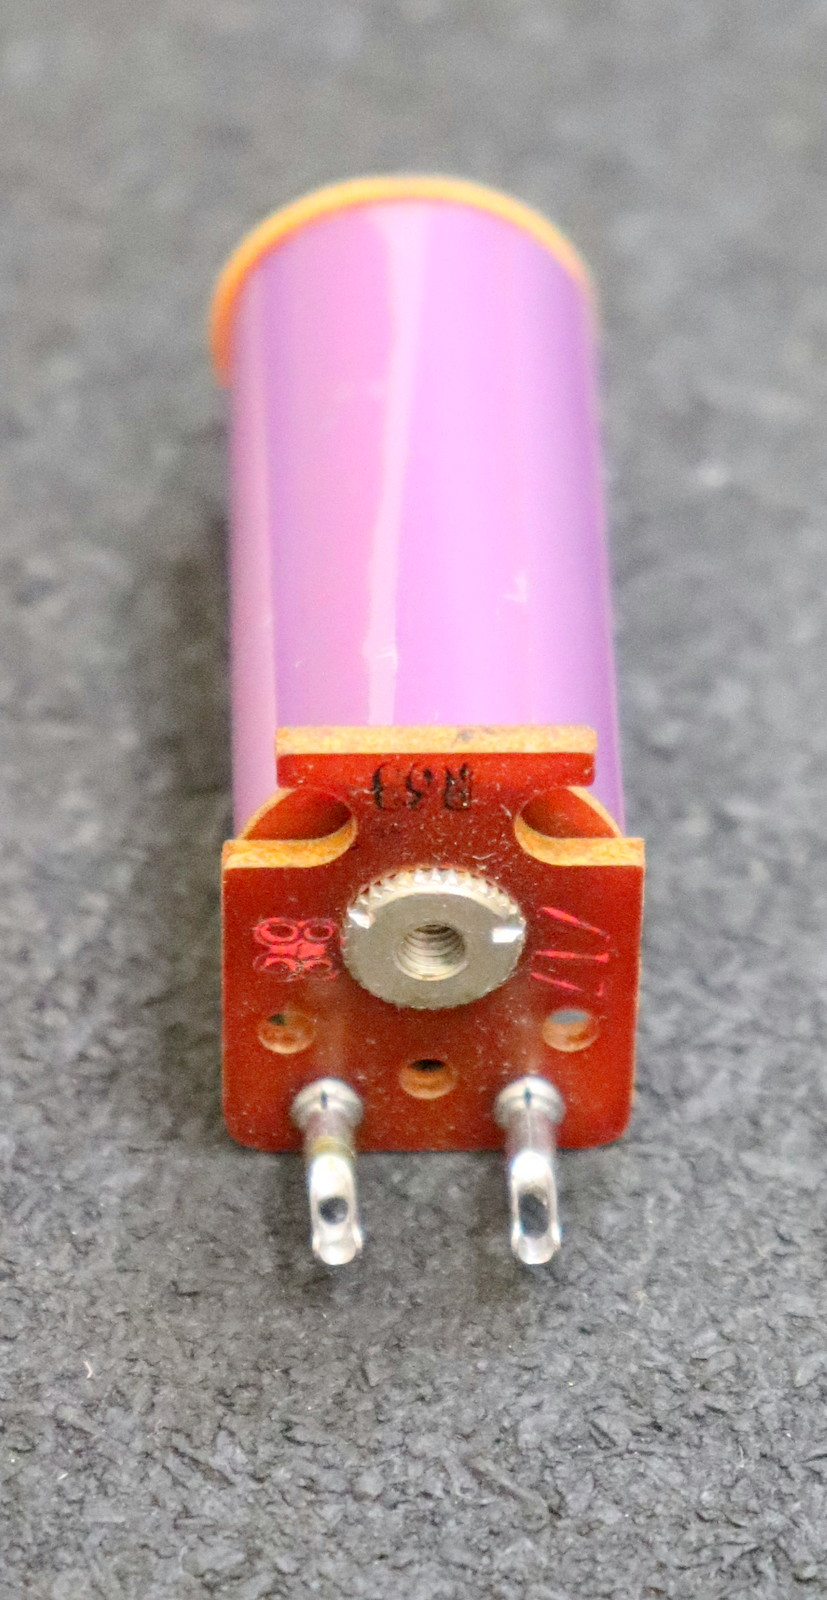 10 Stücke 2,1mm x 5,5mm Weibliche DC Power Steckdose Jack Adapter Stecker LMAB